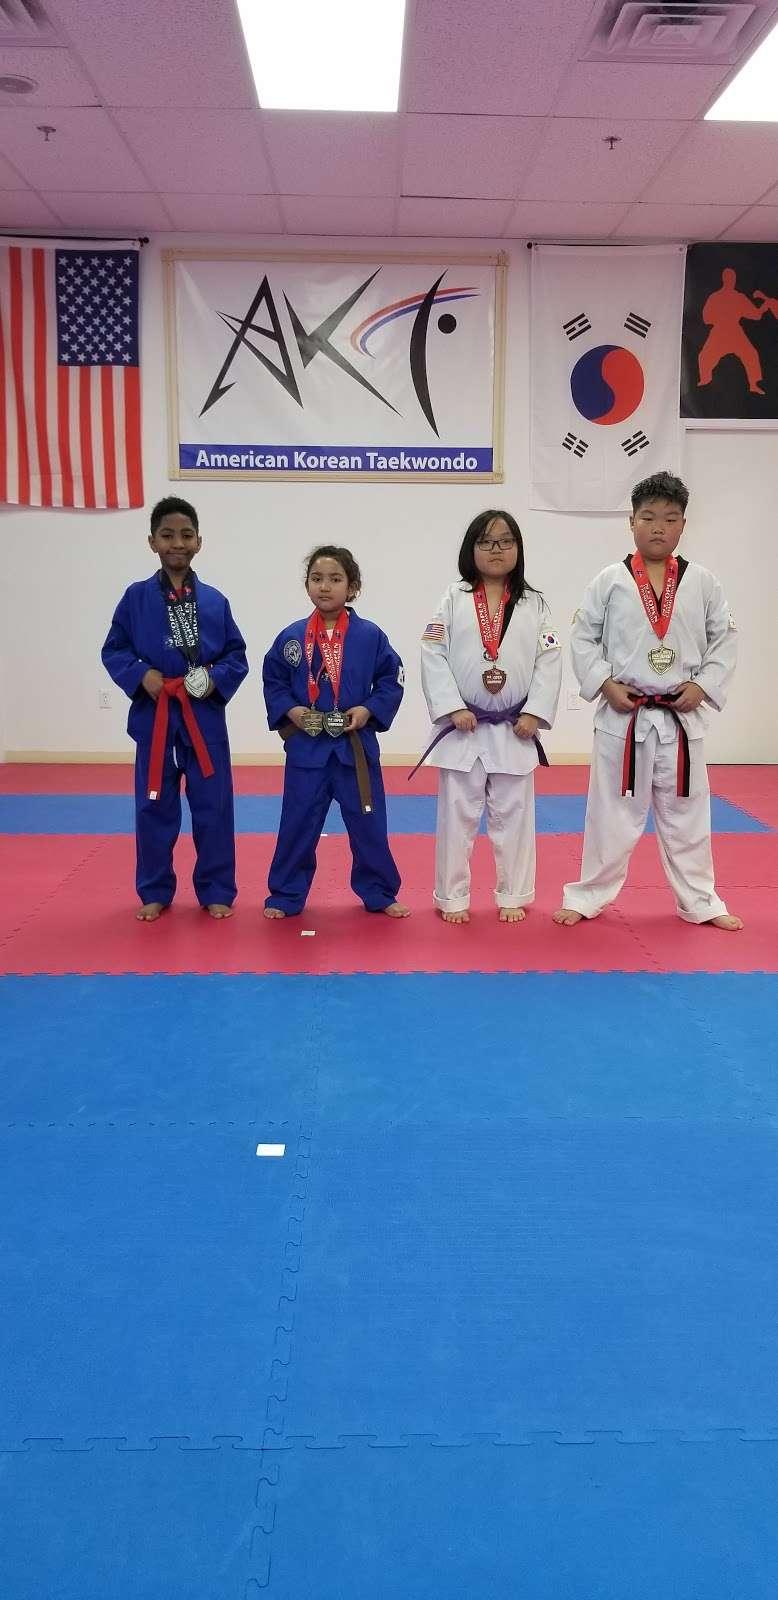 American Korean Taekwondo - health  | Photo 3 of 10 | Address: 1560 Teaneck Rd, Teaneck, NJ 07666, USA | Phone: (201) 837-0082